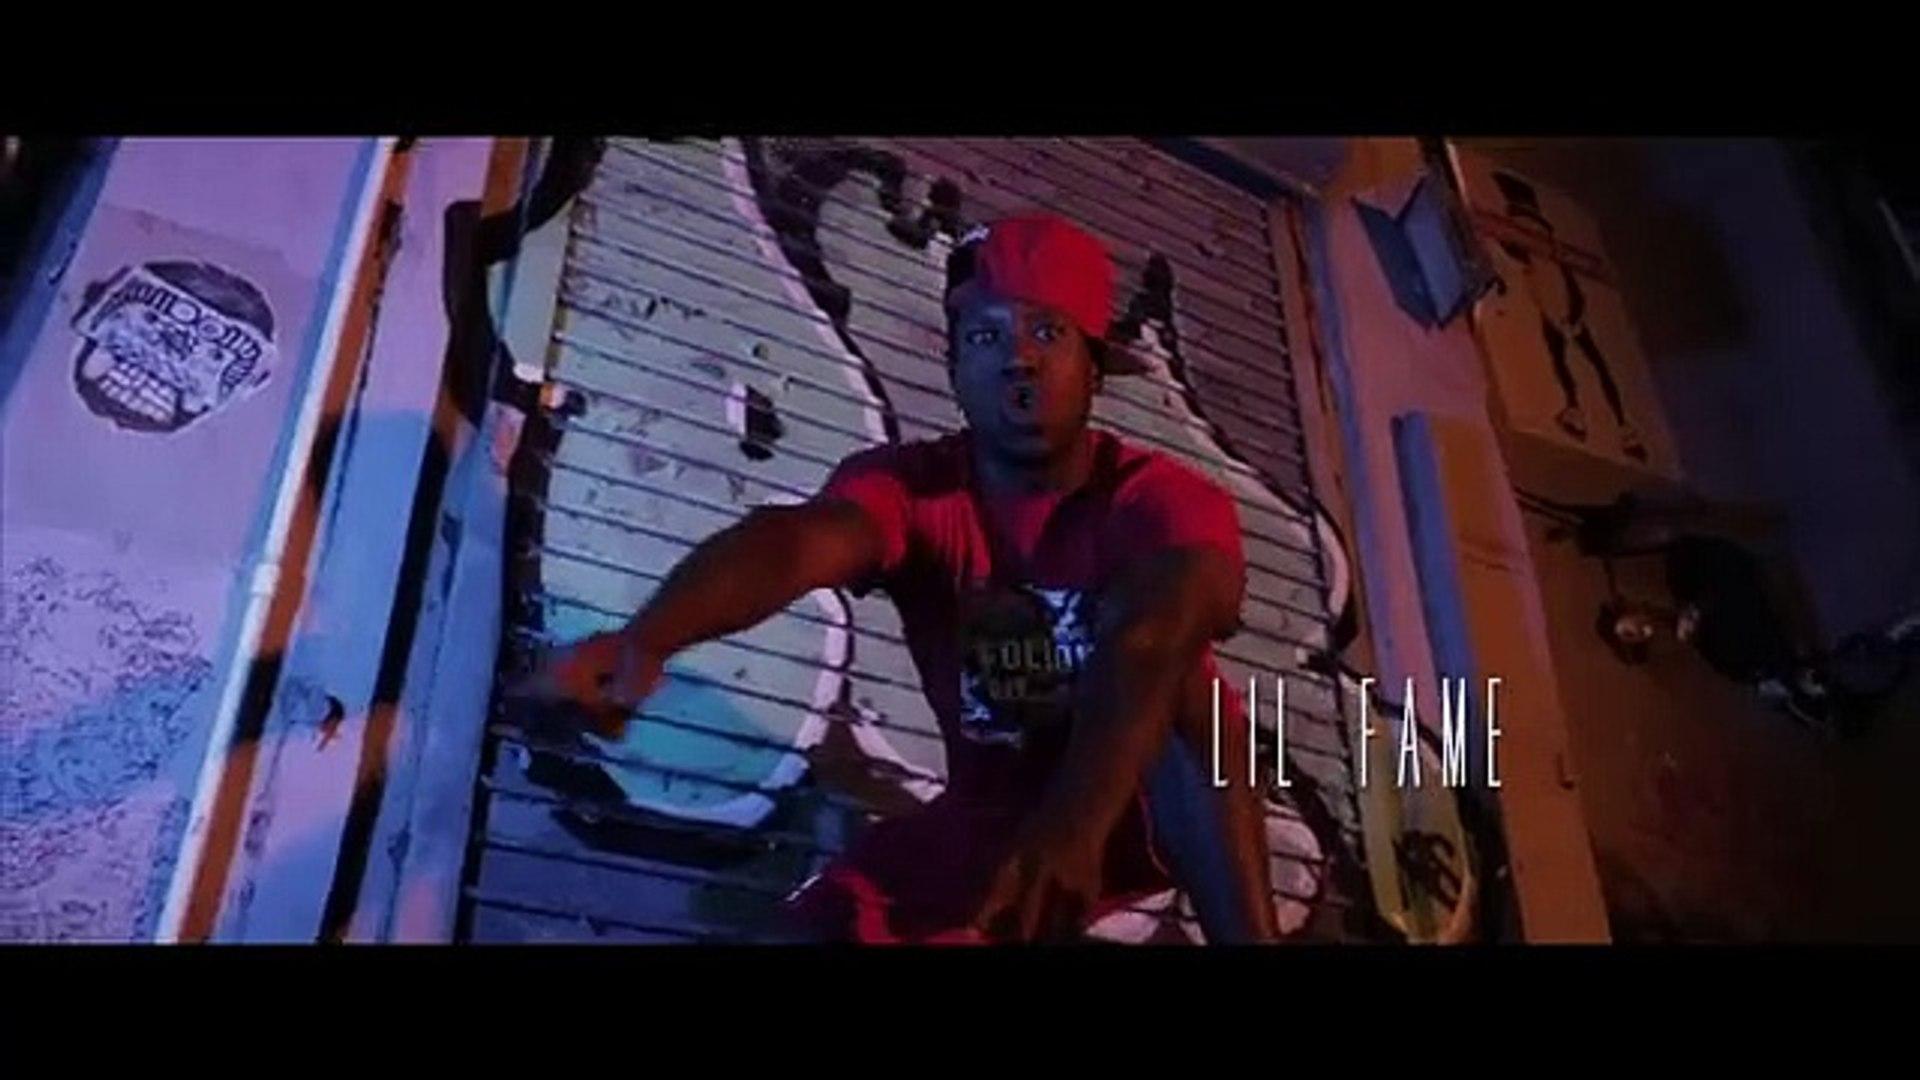 DJ KaySlay - Rolling 50 Deep F AZ, Ghostface, Raekwon, Cassidy, Benny, Ransom, Styles P, M.O.P (Vid)